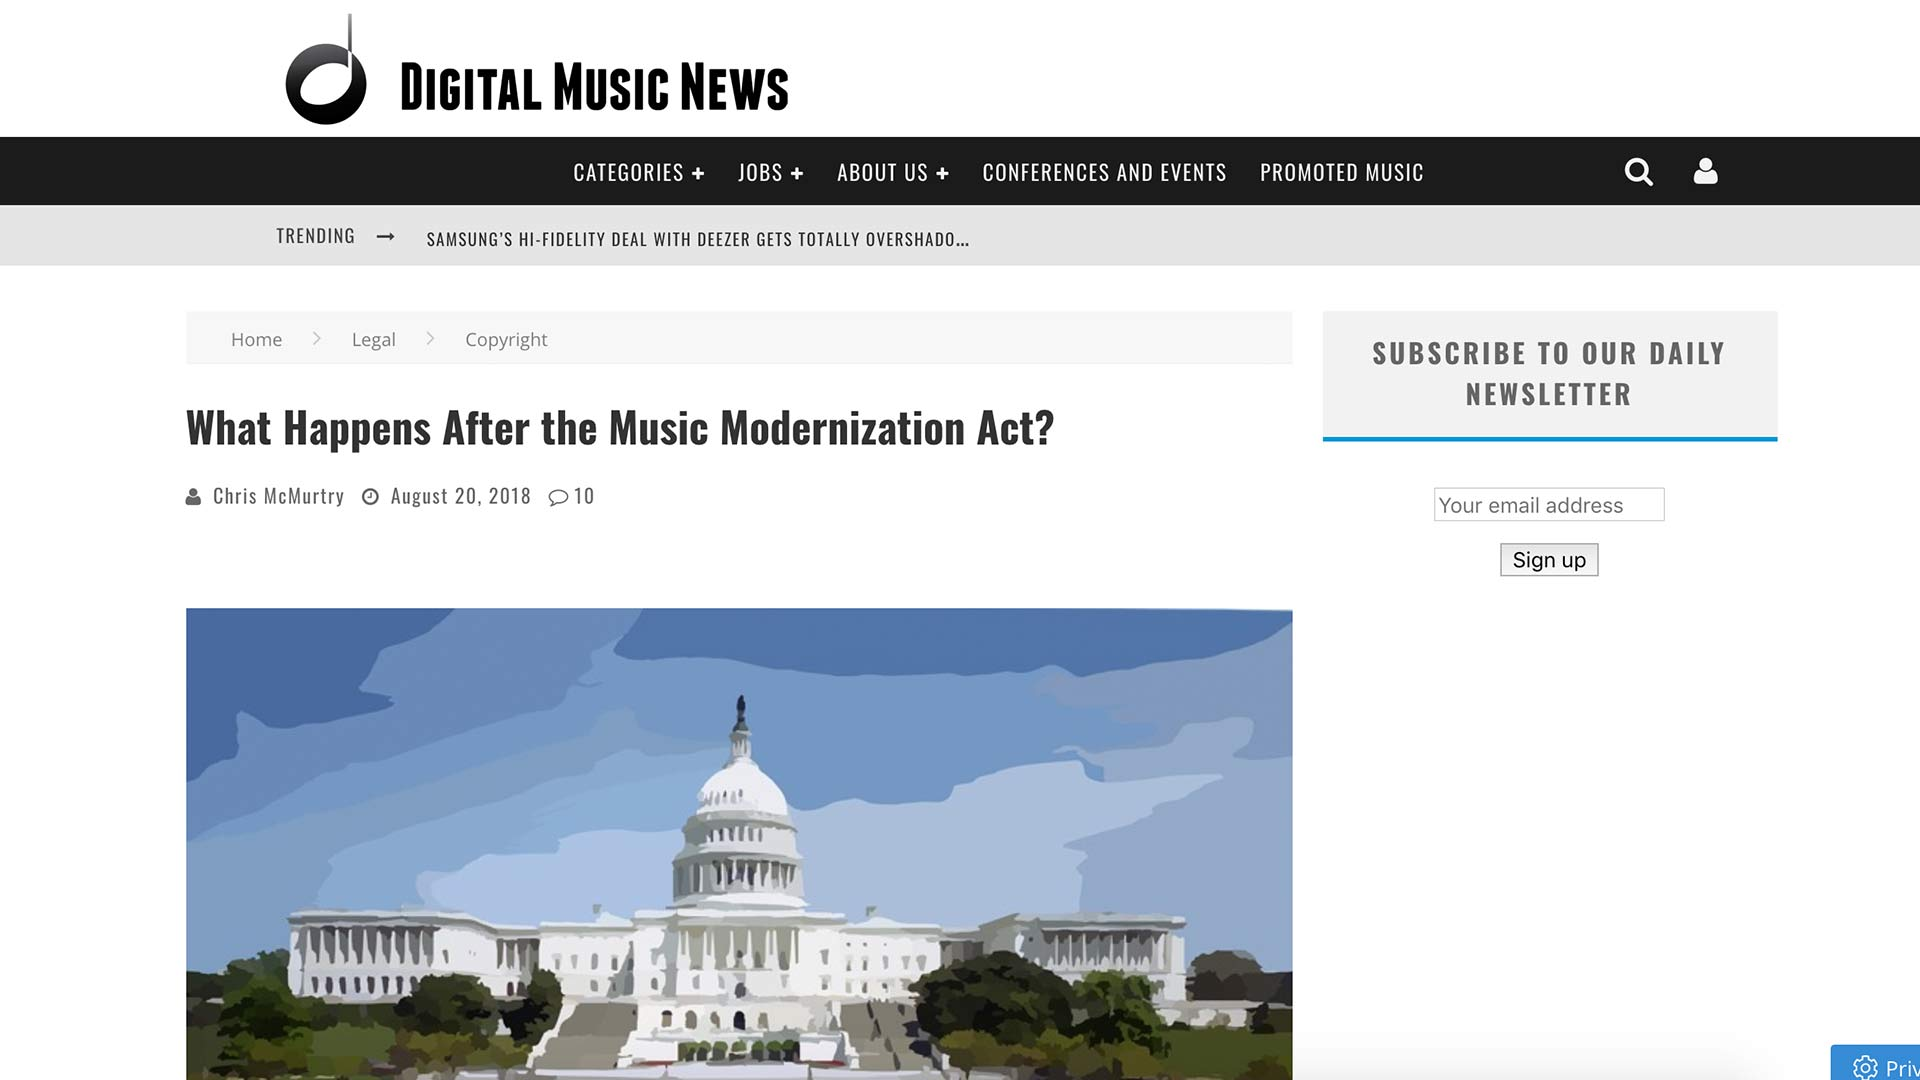 Fairness Rocks News What Happens After the Music Modernization Act?